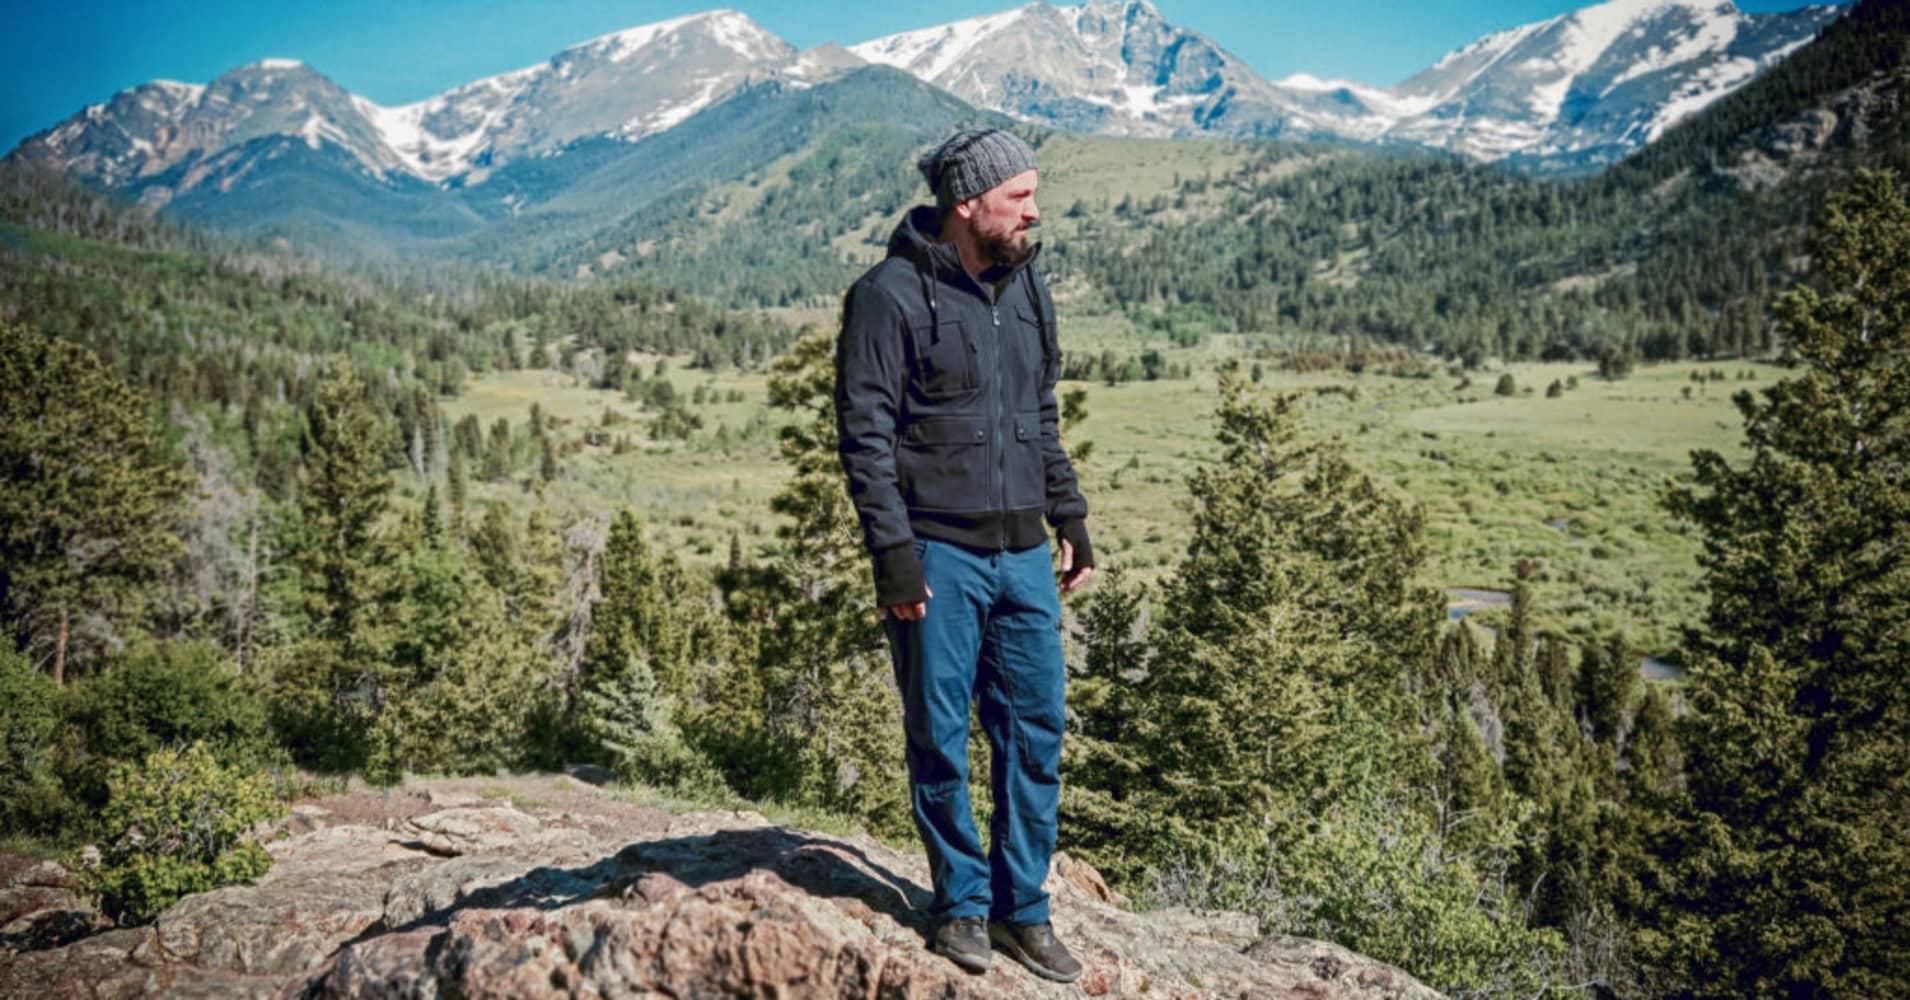 Zane Lamprey, creator of the ADV3NTURE Hoodie